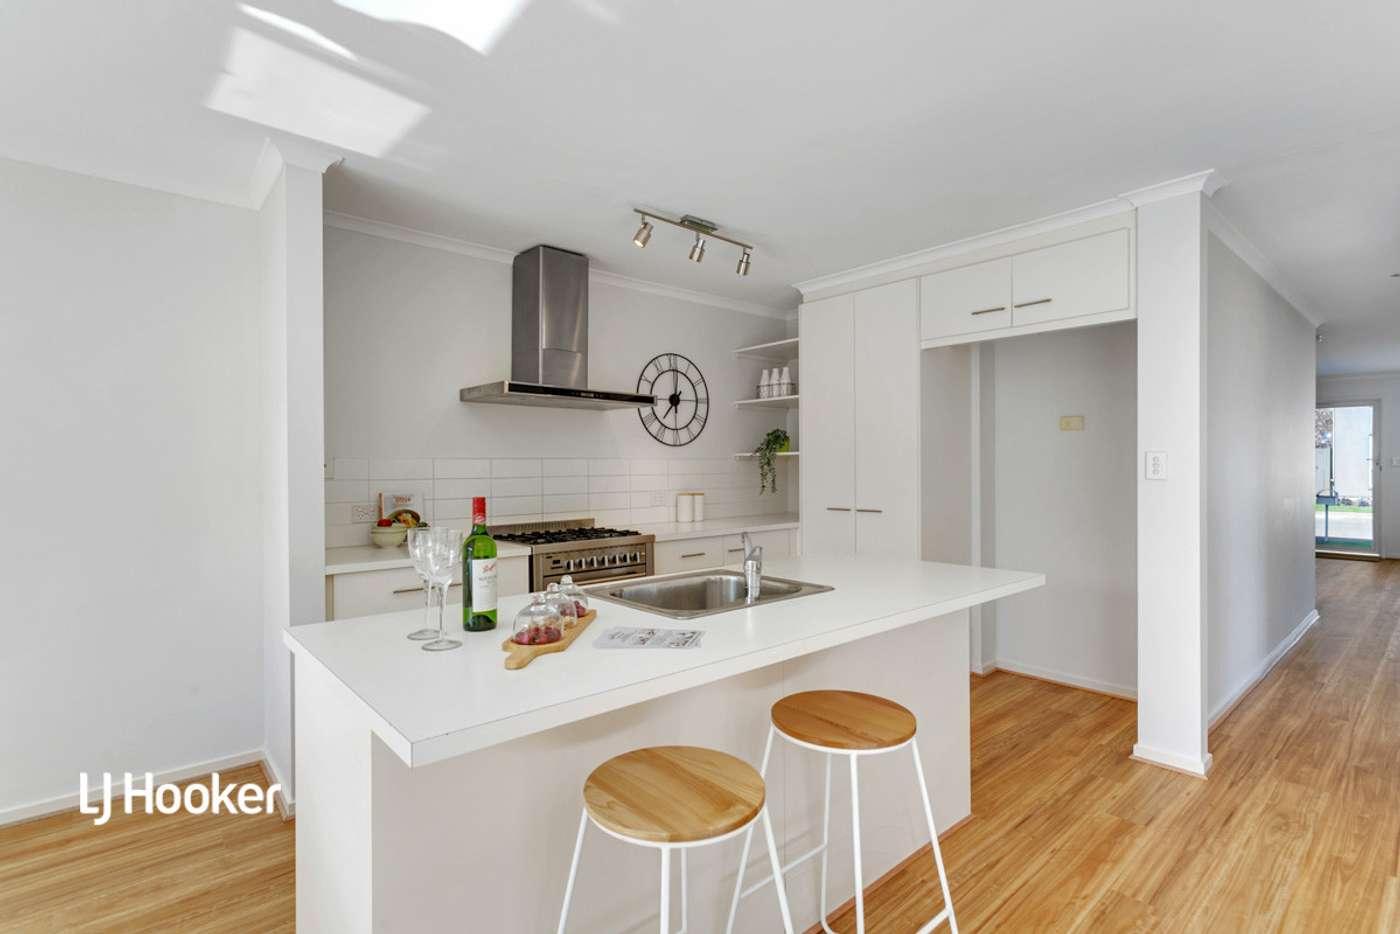 Fifth view of Homely house listing, 18 William Langman Circuit, Ridleyton SA 5008